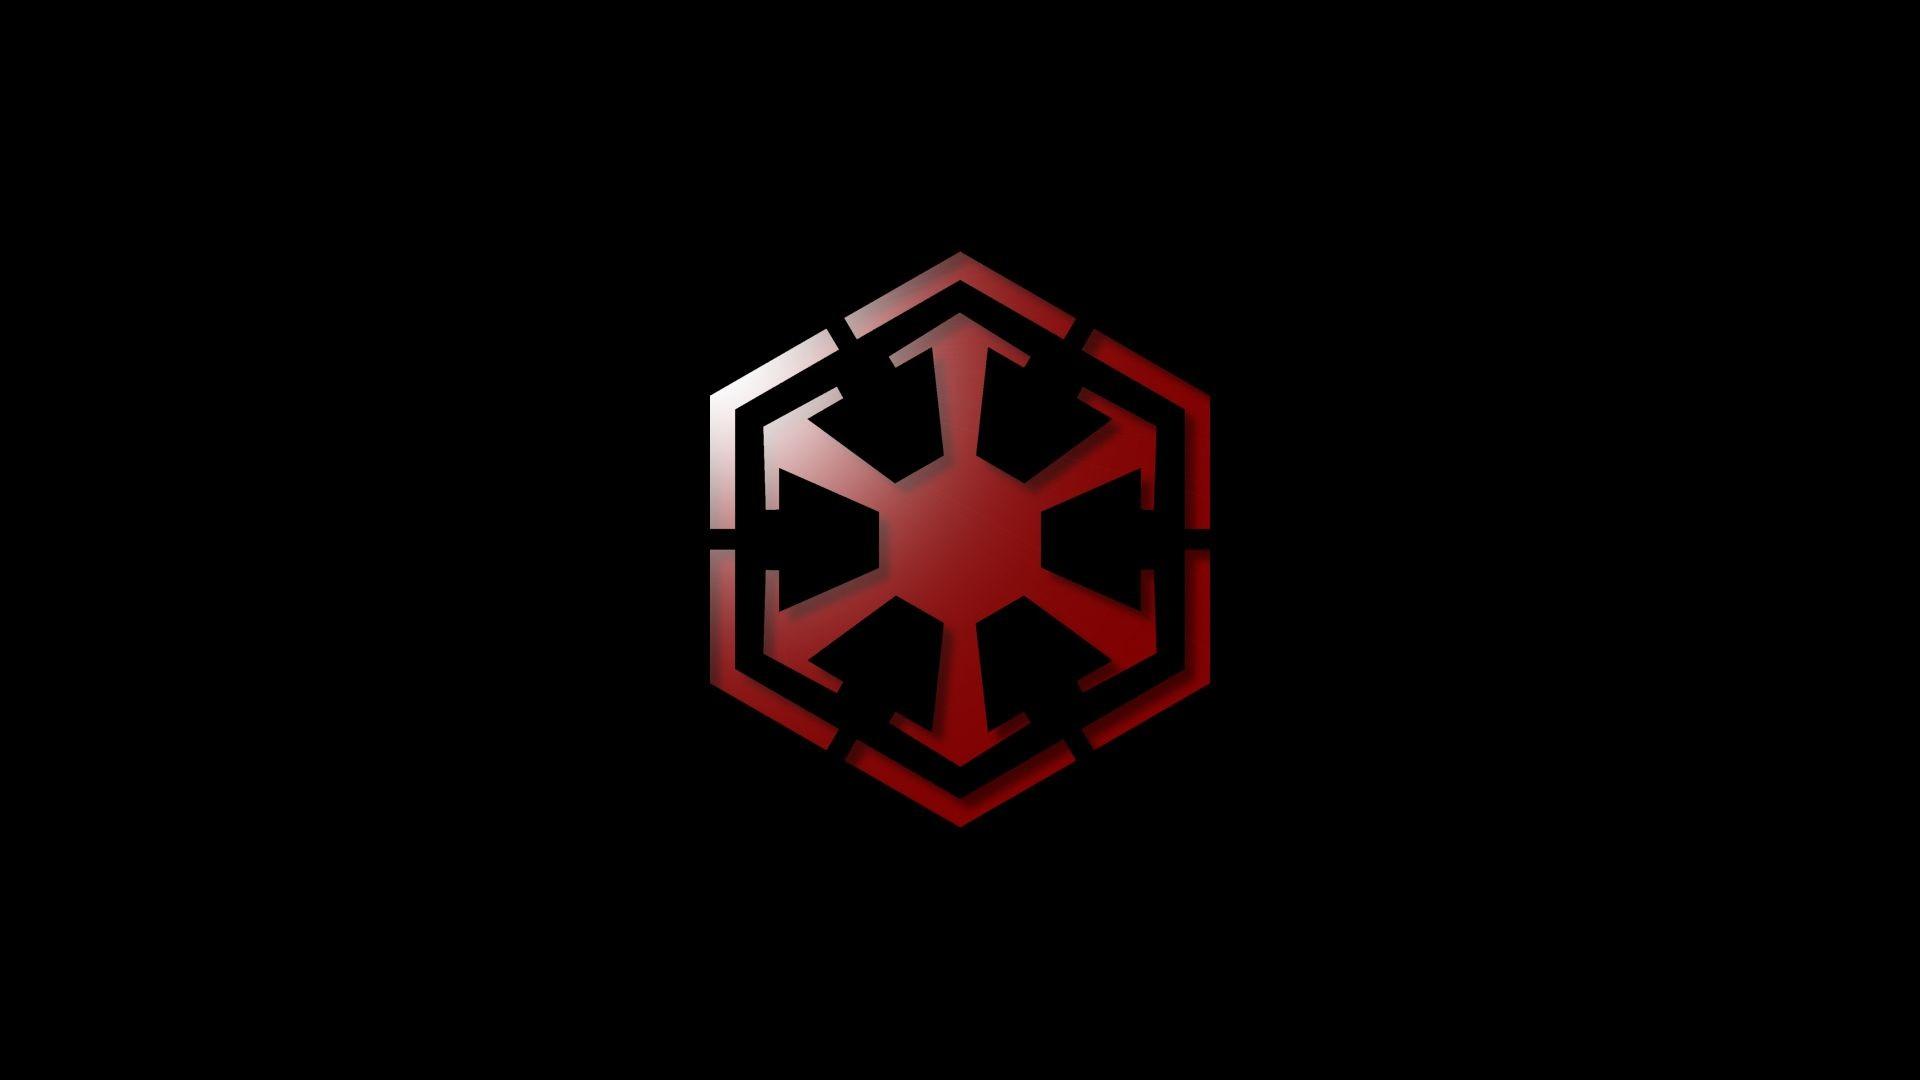 Sith Code Wallpaper, Full HD 1080p, Best HD Sith Code .